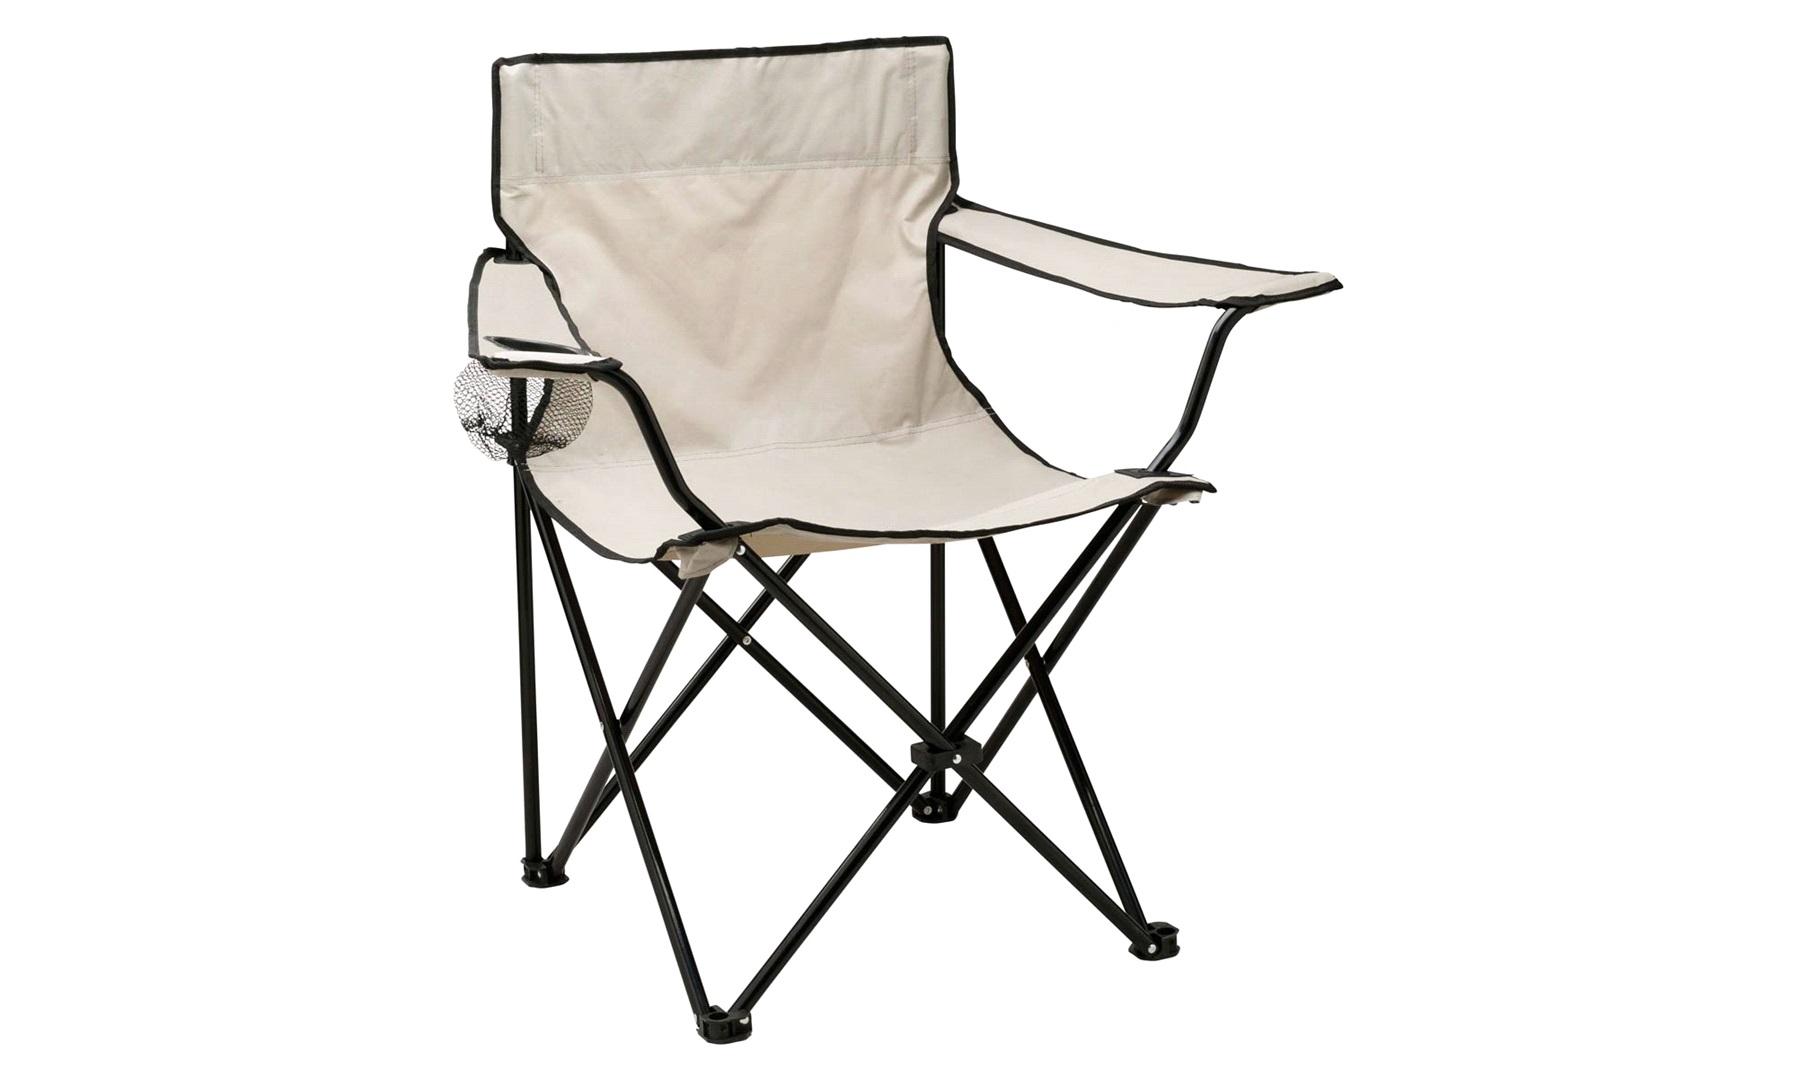 Campingstol, sammenleggbar, Camp+nature Campingstol